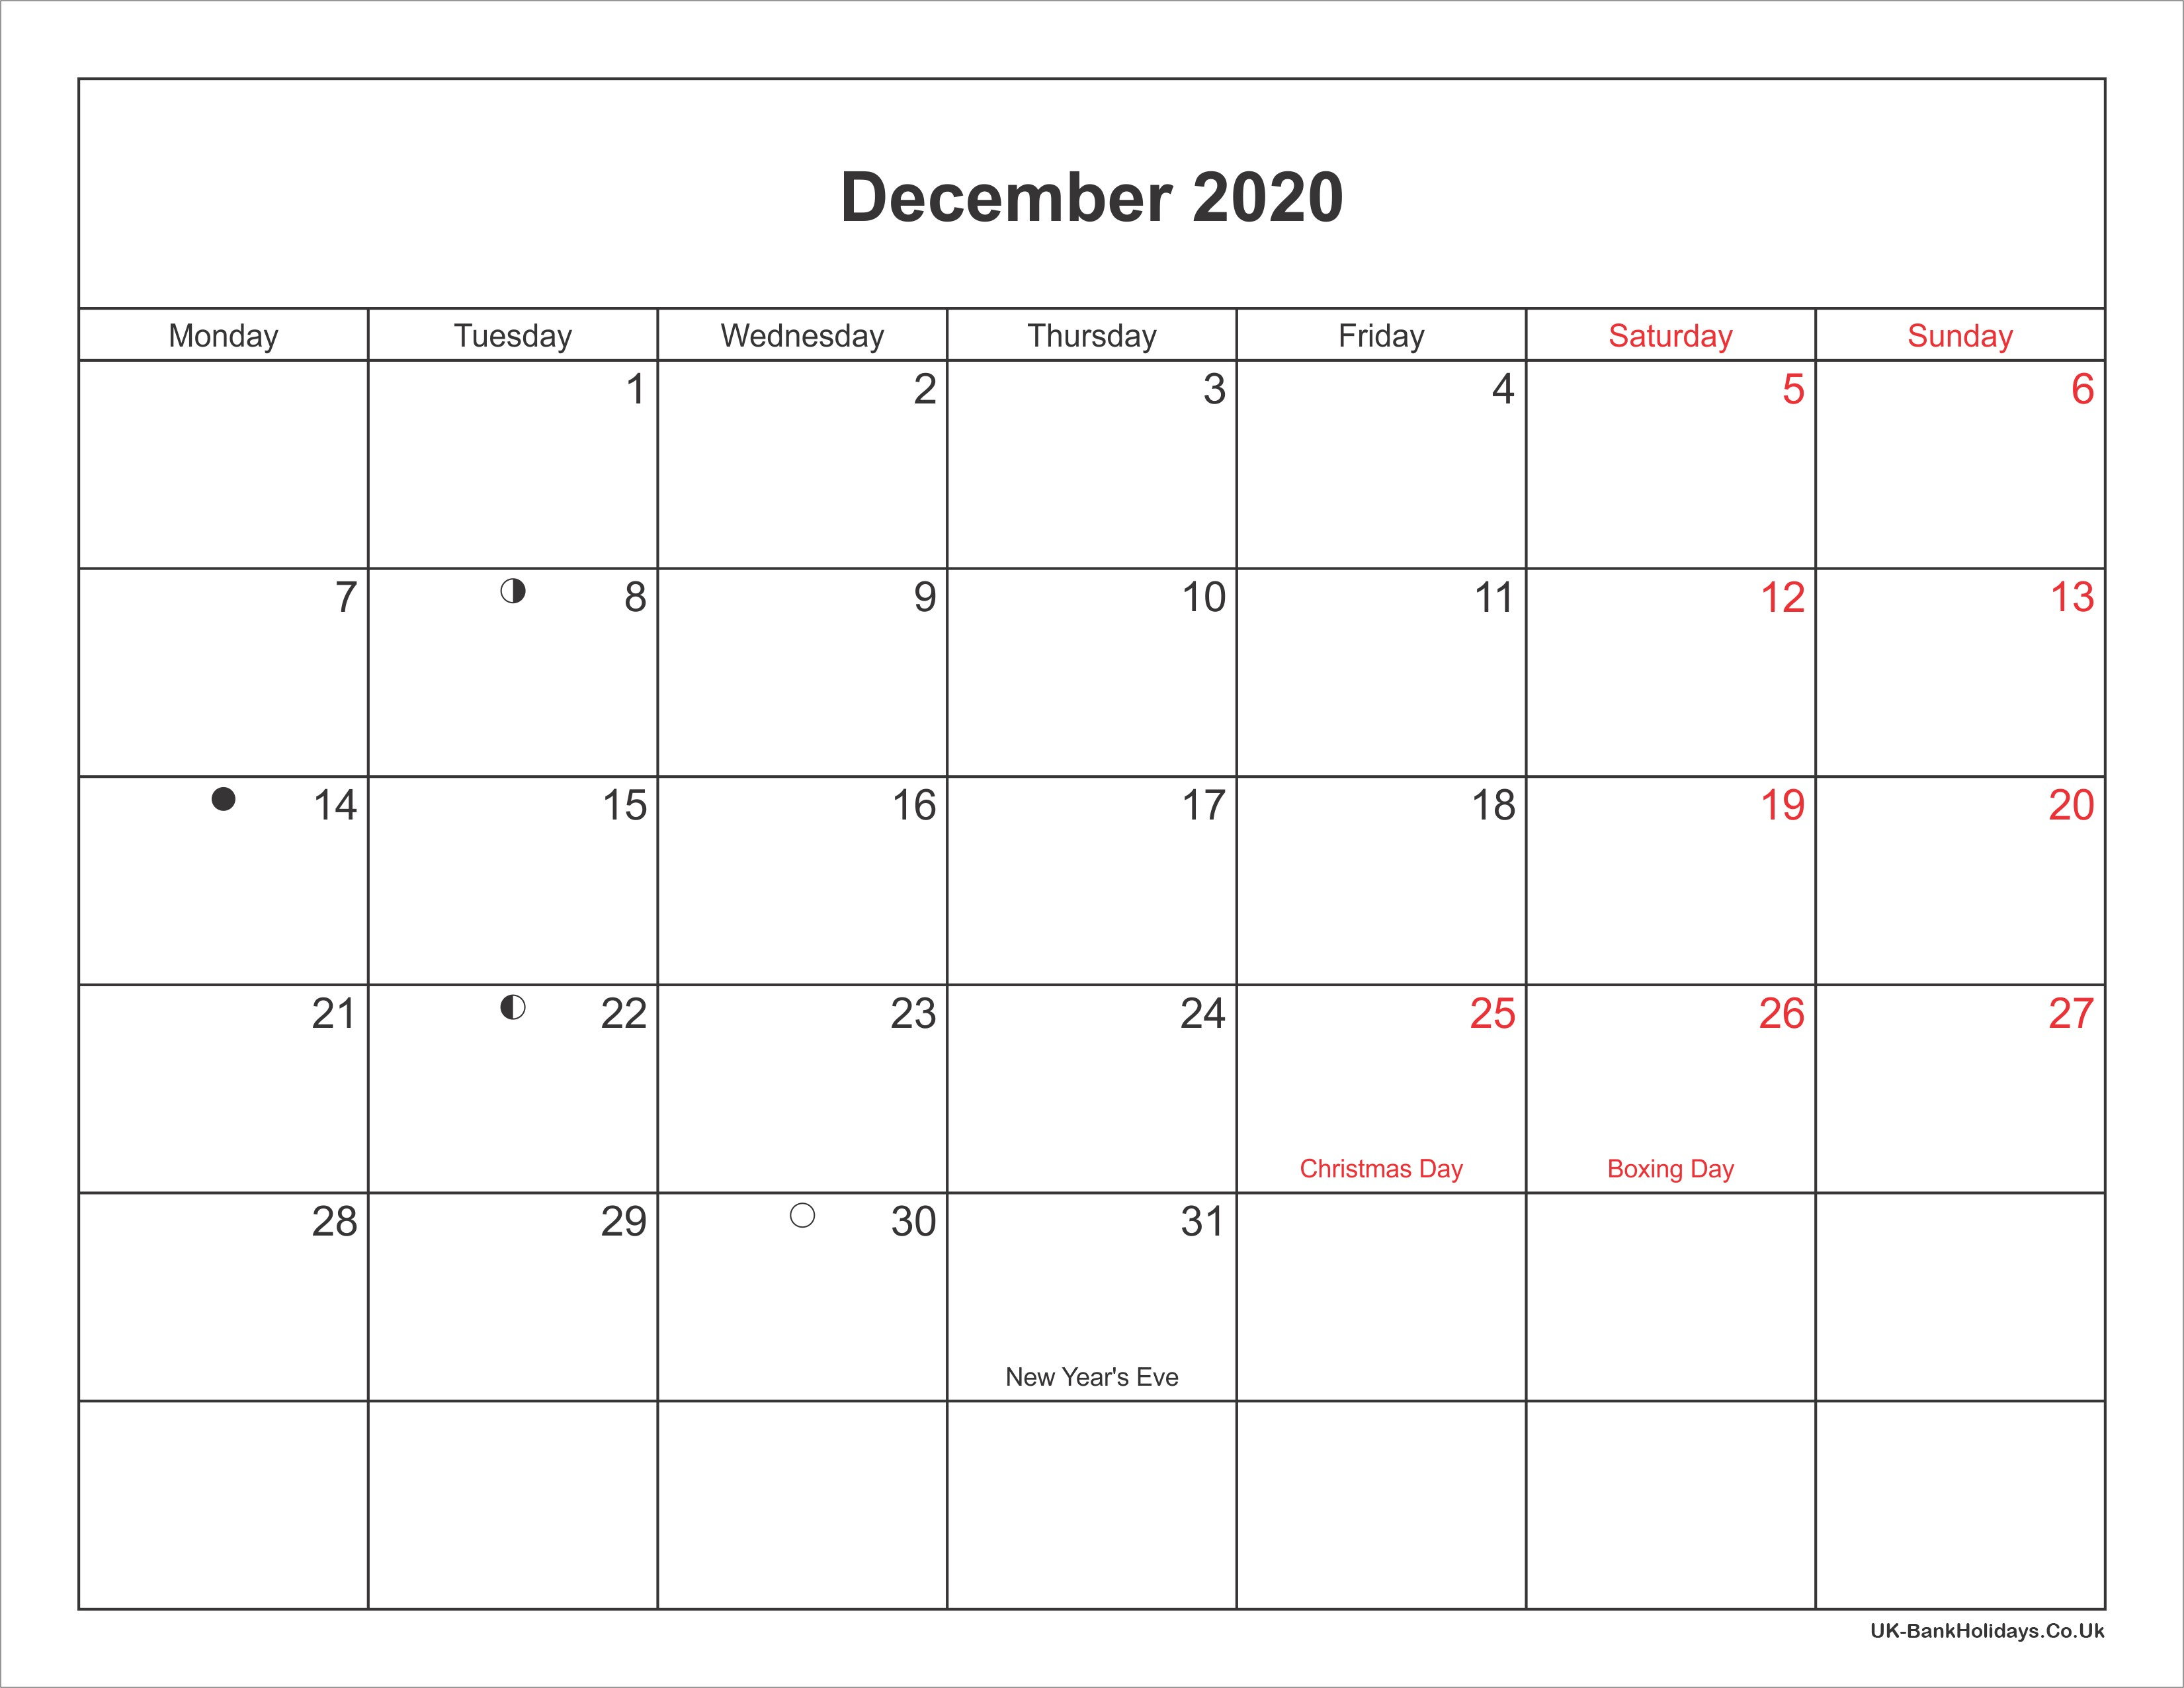 December 2020 Calendar Printable with Bank Holidays UK